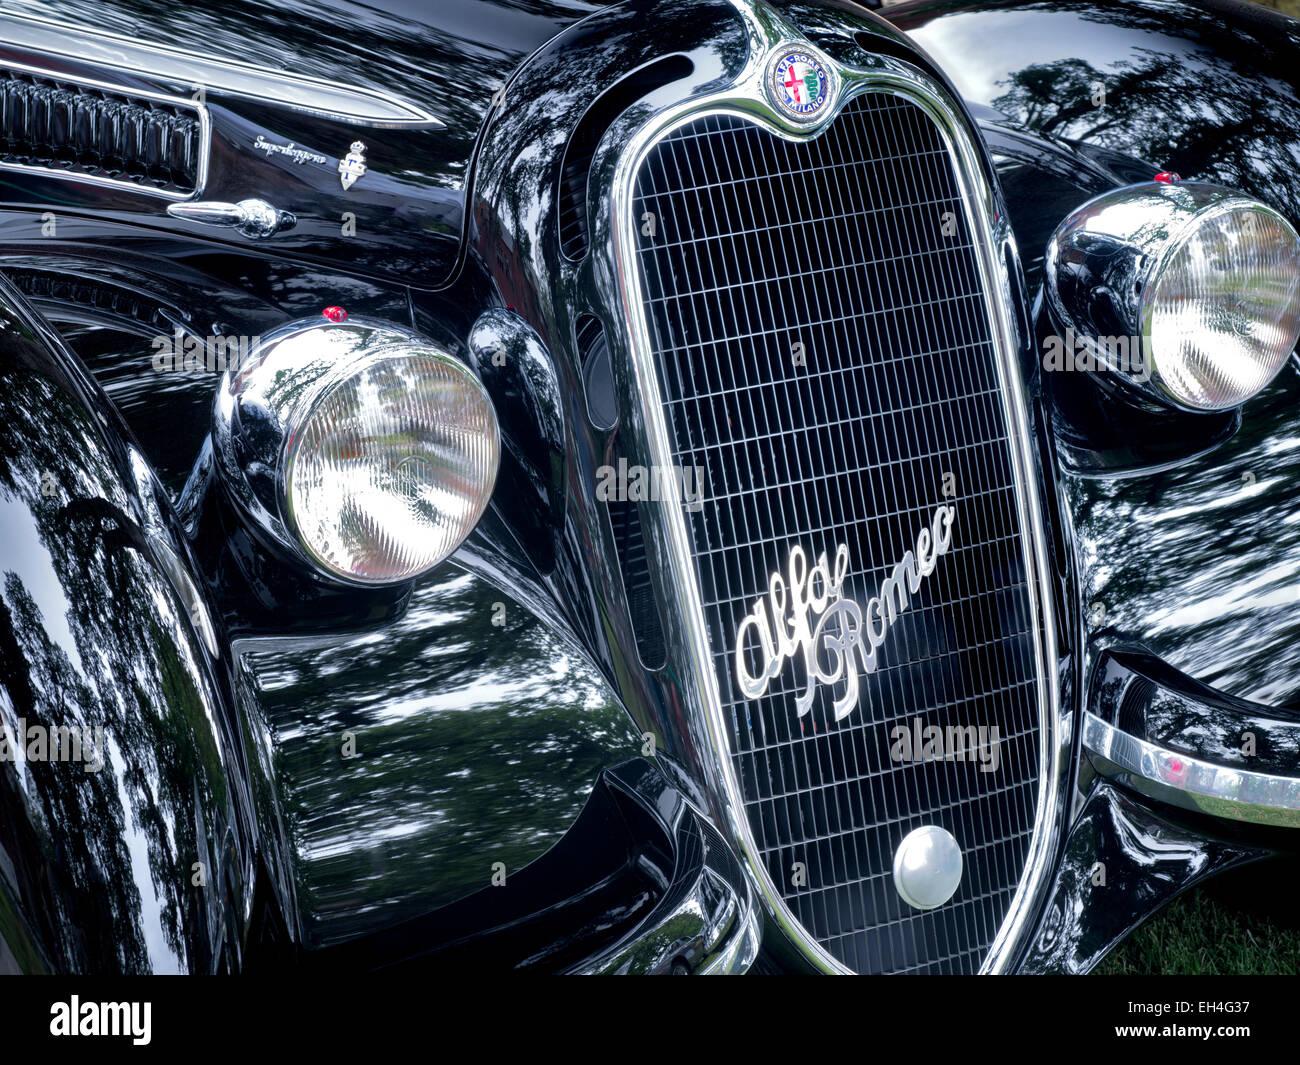 1938 Alfa Romeo S11 Corto. Oregon Stockbild